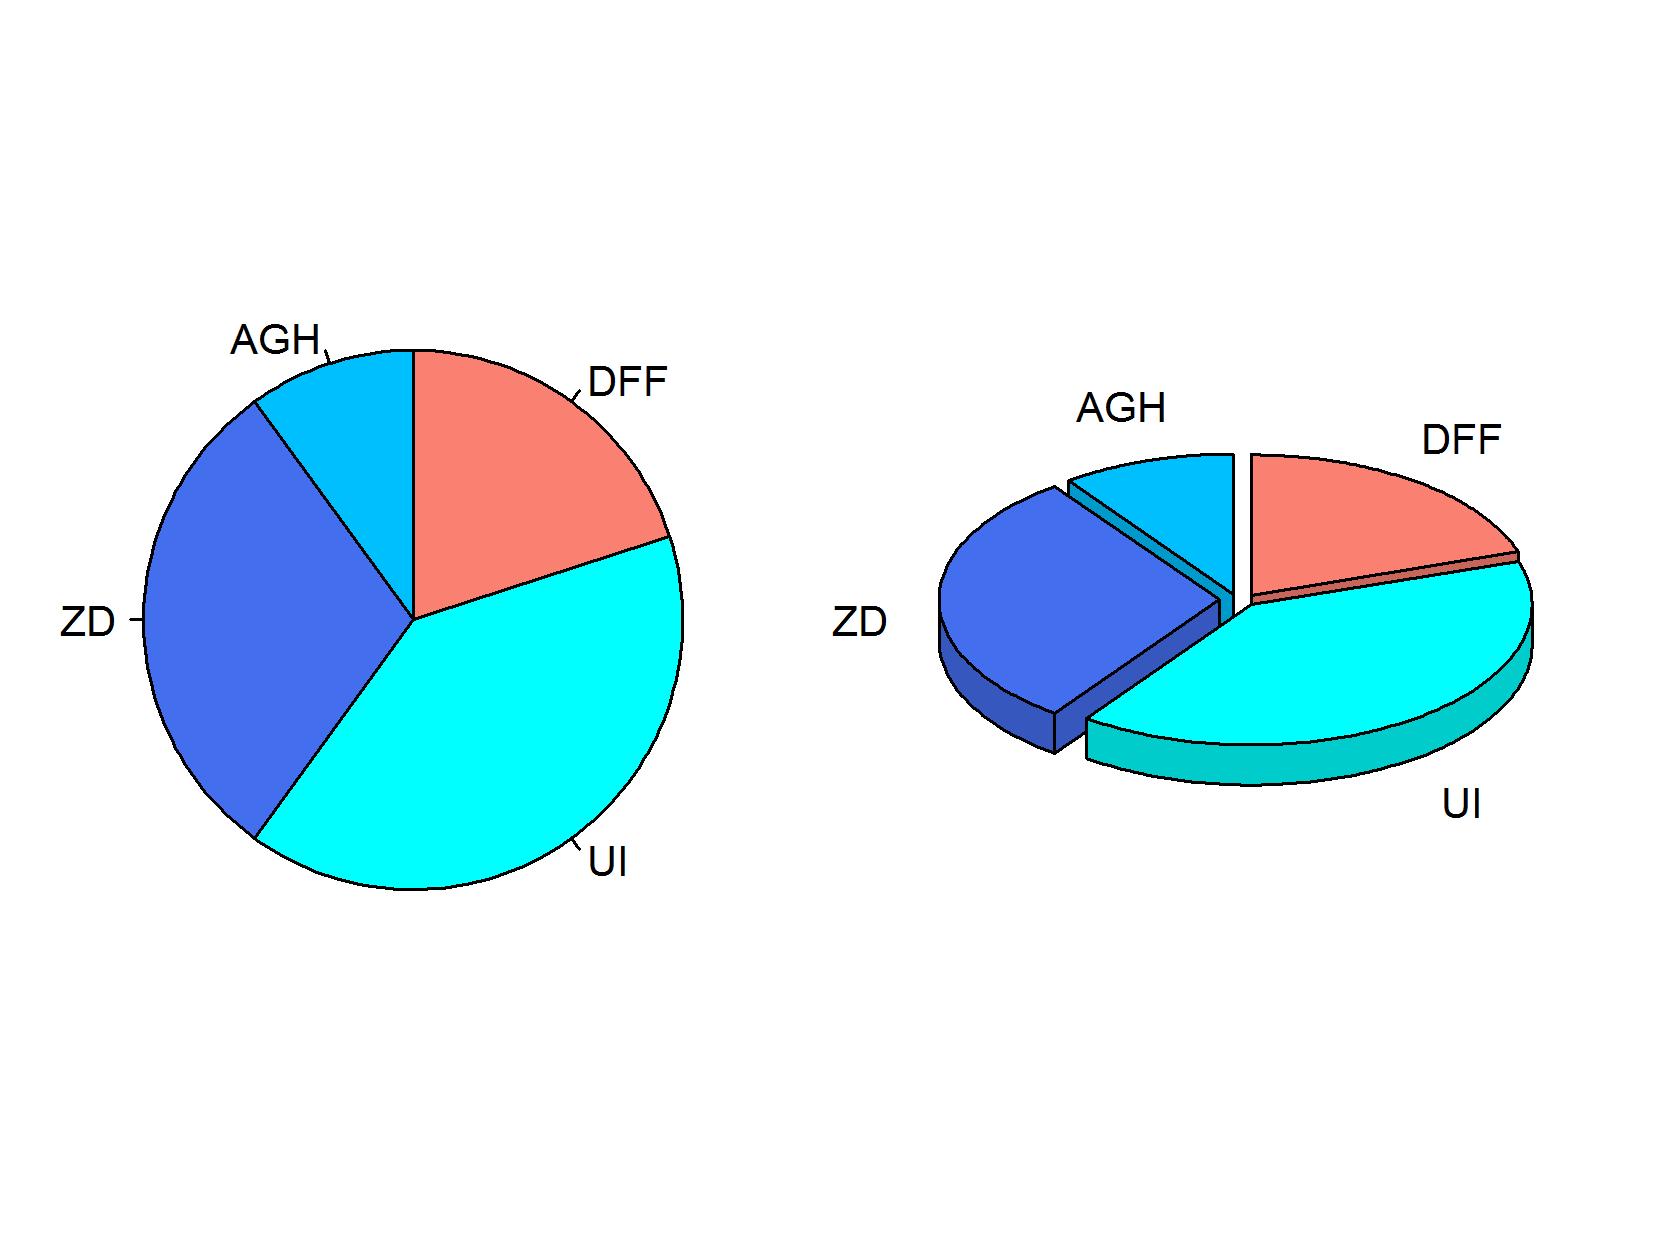 Kuchen- bzw. Kreisdiagramm